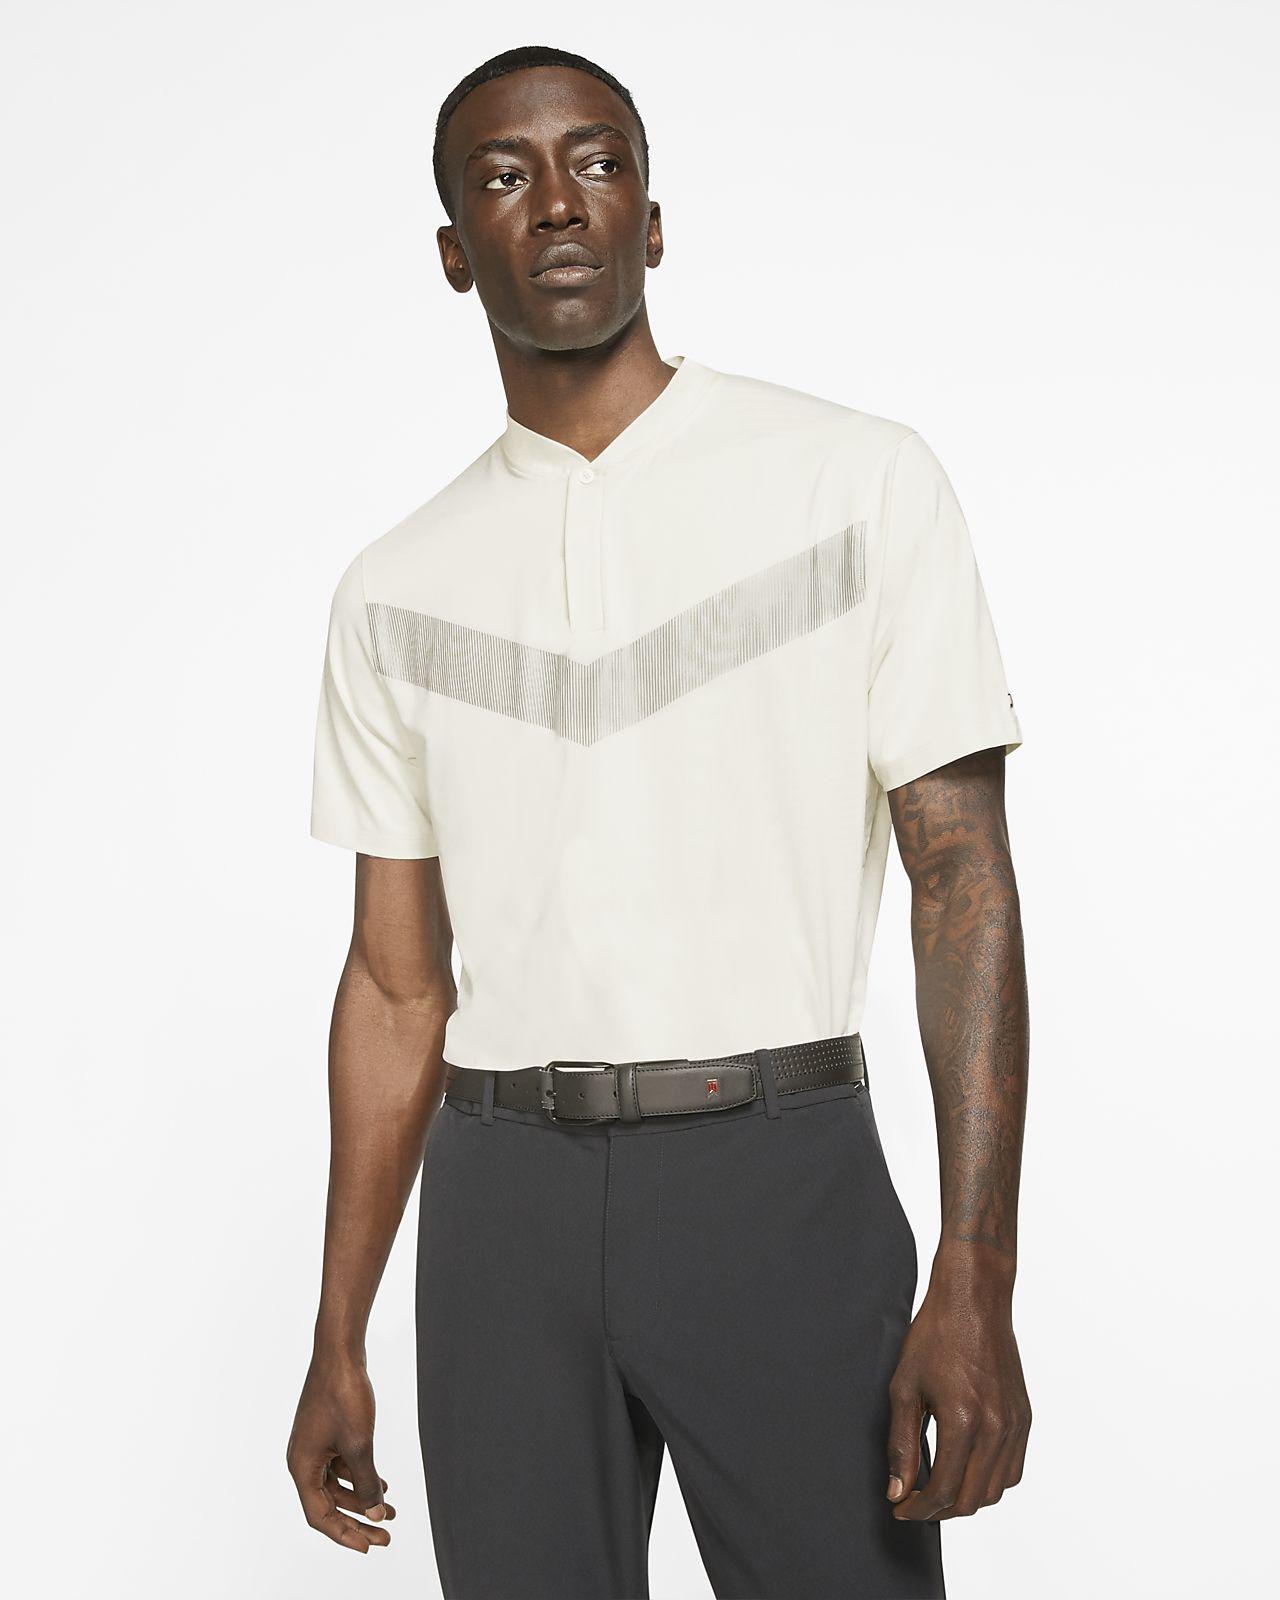 Nike Dri-FIT Tiger Woods Vapor Men's Golf Polo